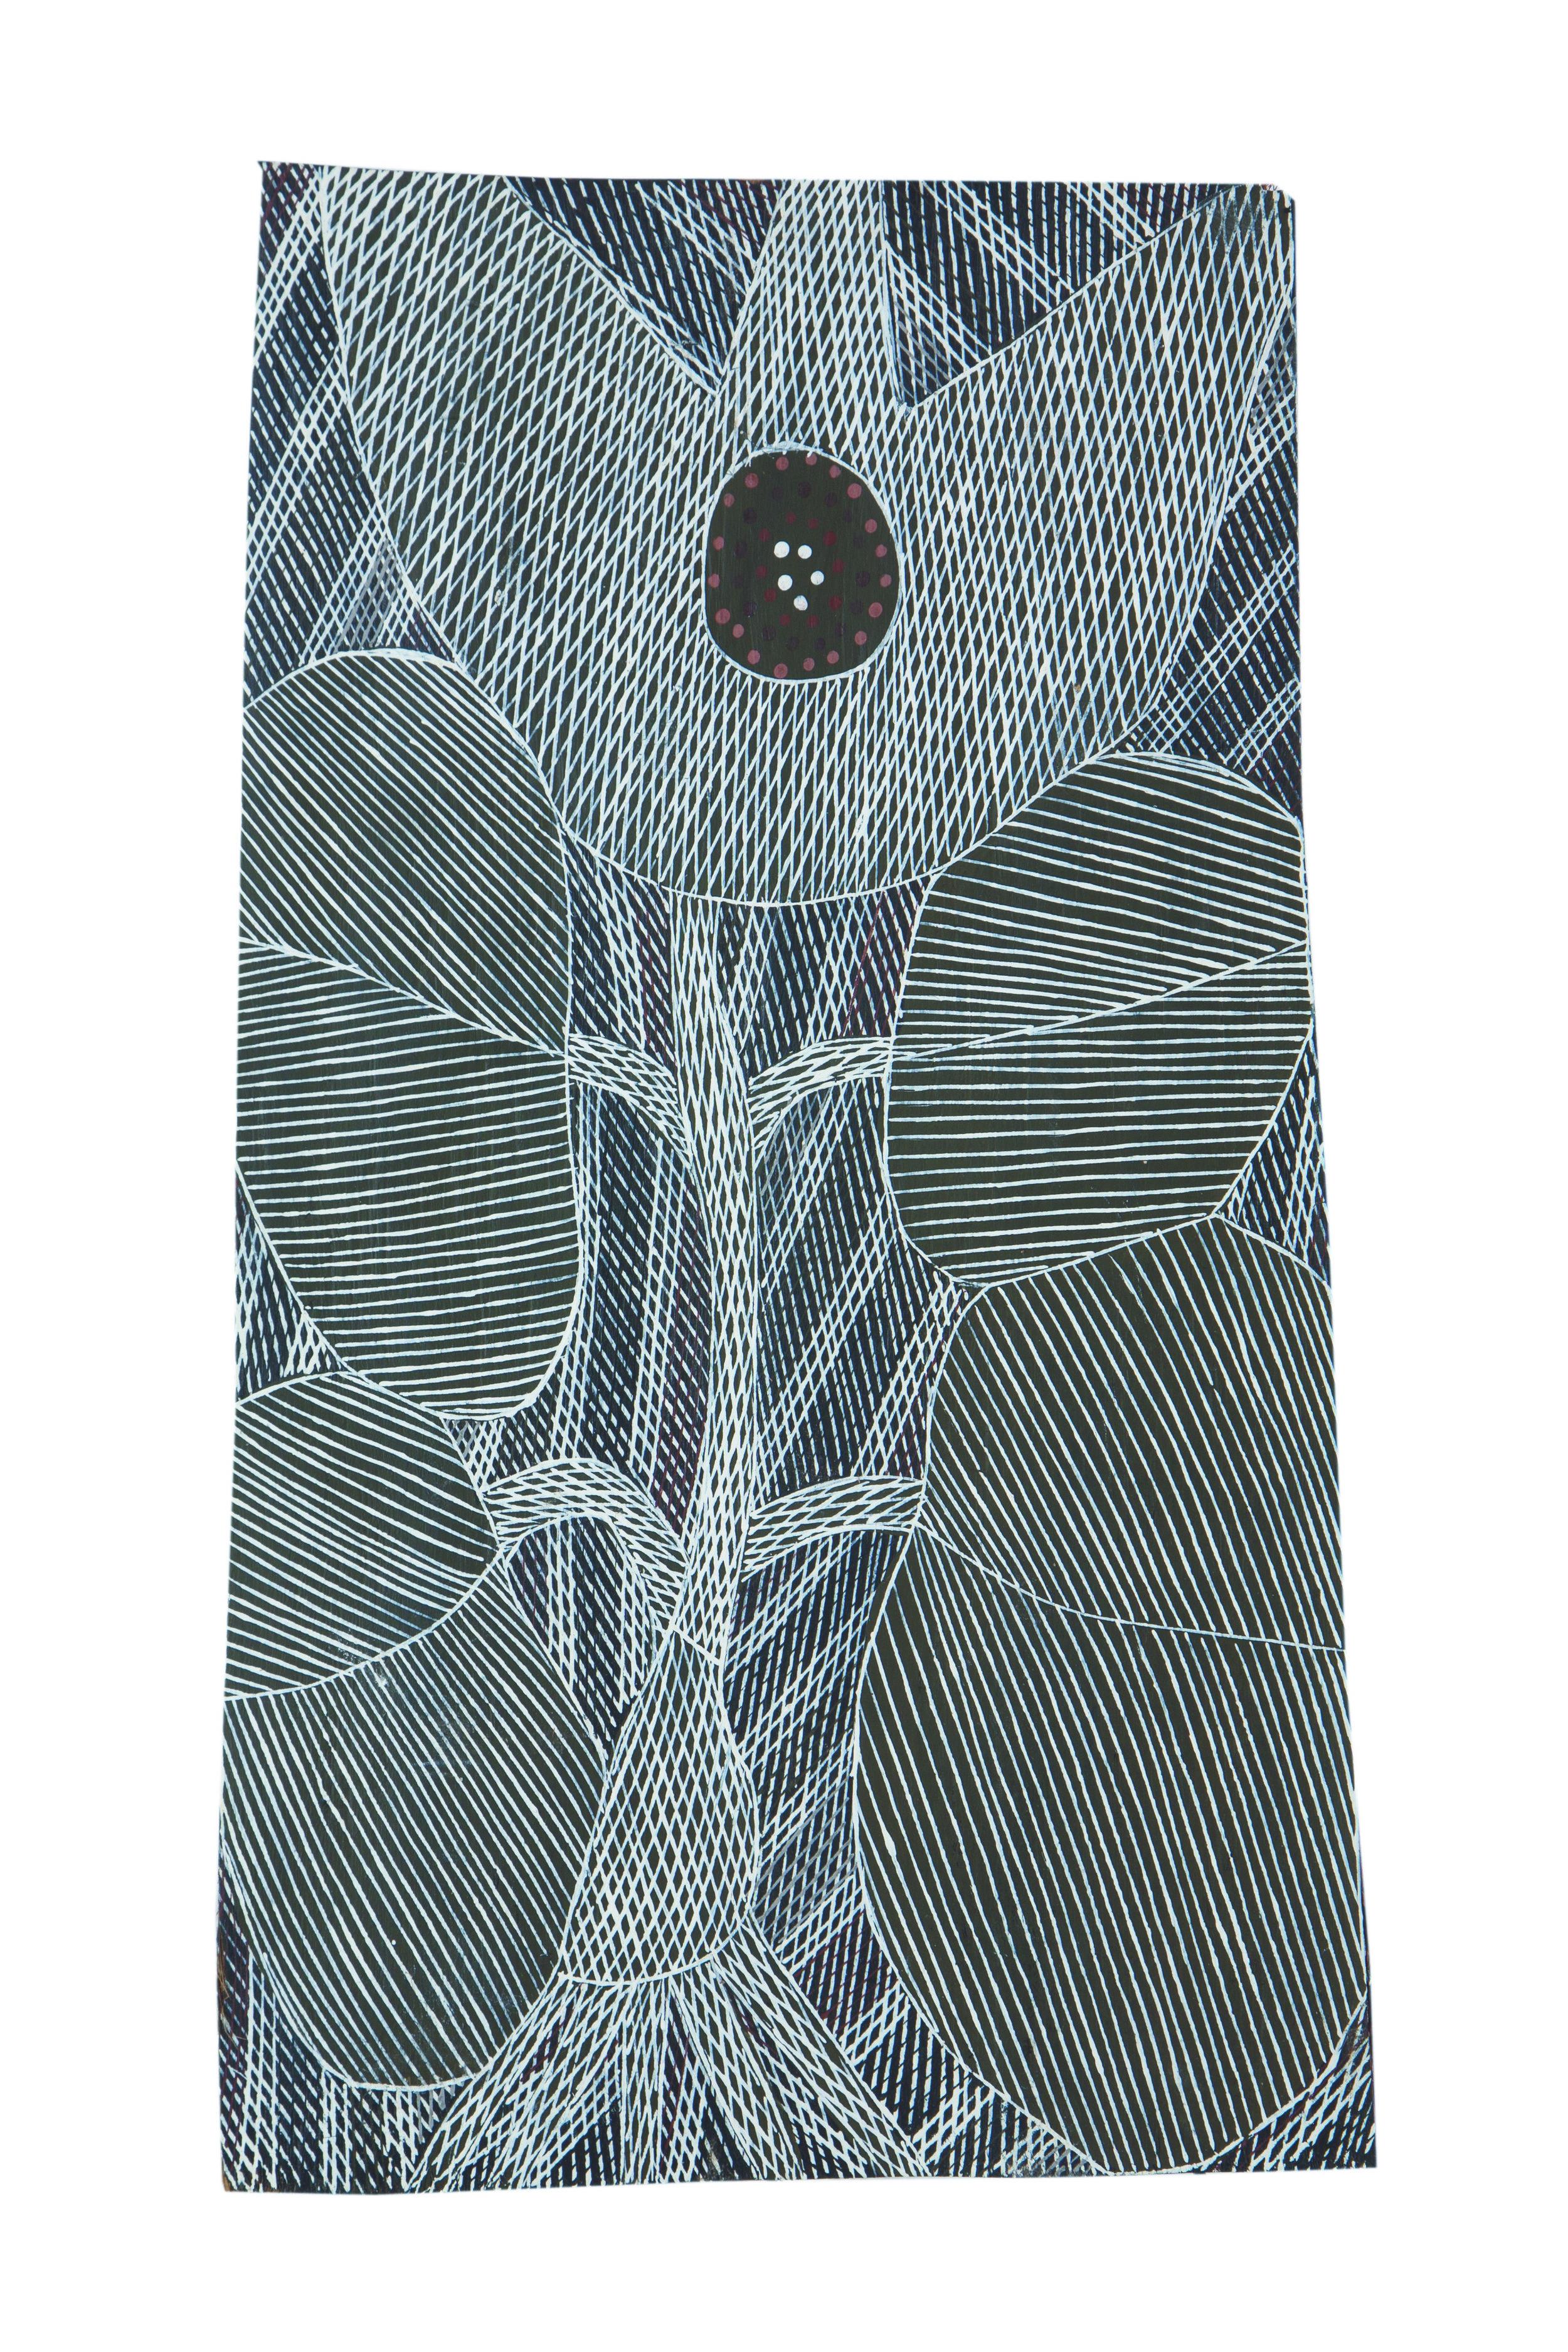 Malaluba Gumana  Dhatam Lily  Natural earth pigments on bark 23 x 17 cm Buku Larrnggay Mulka #4275A   EMAIL INQUIRY